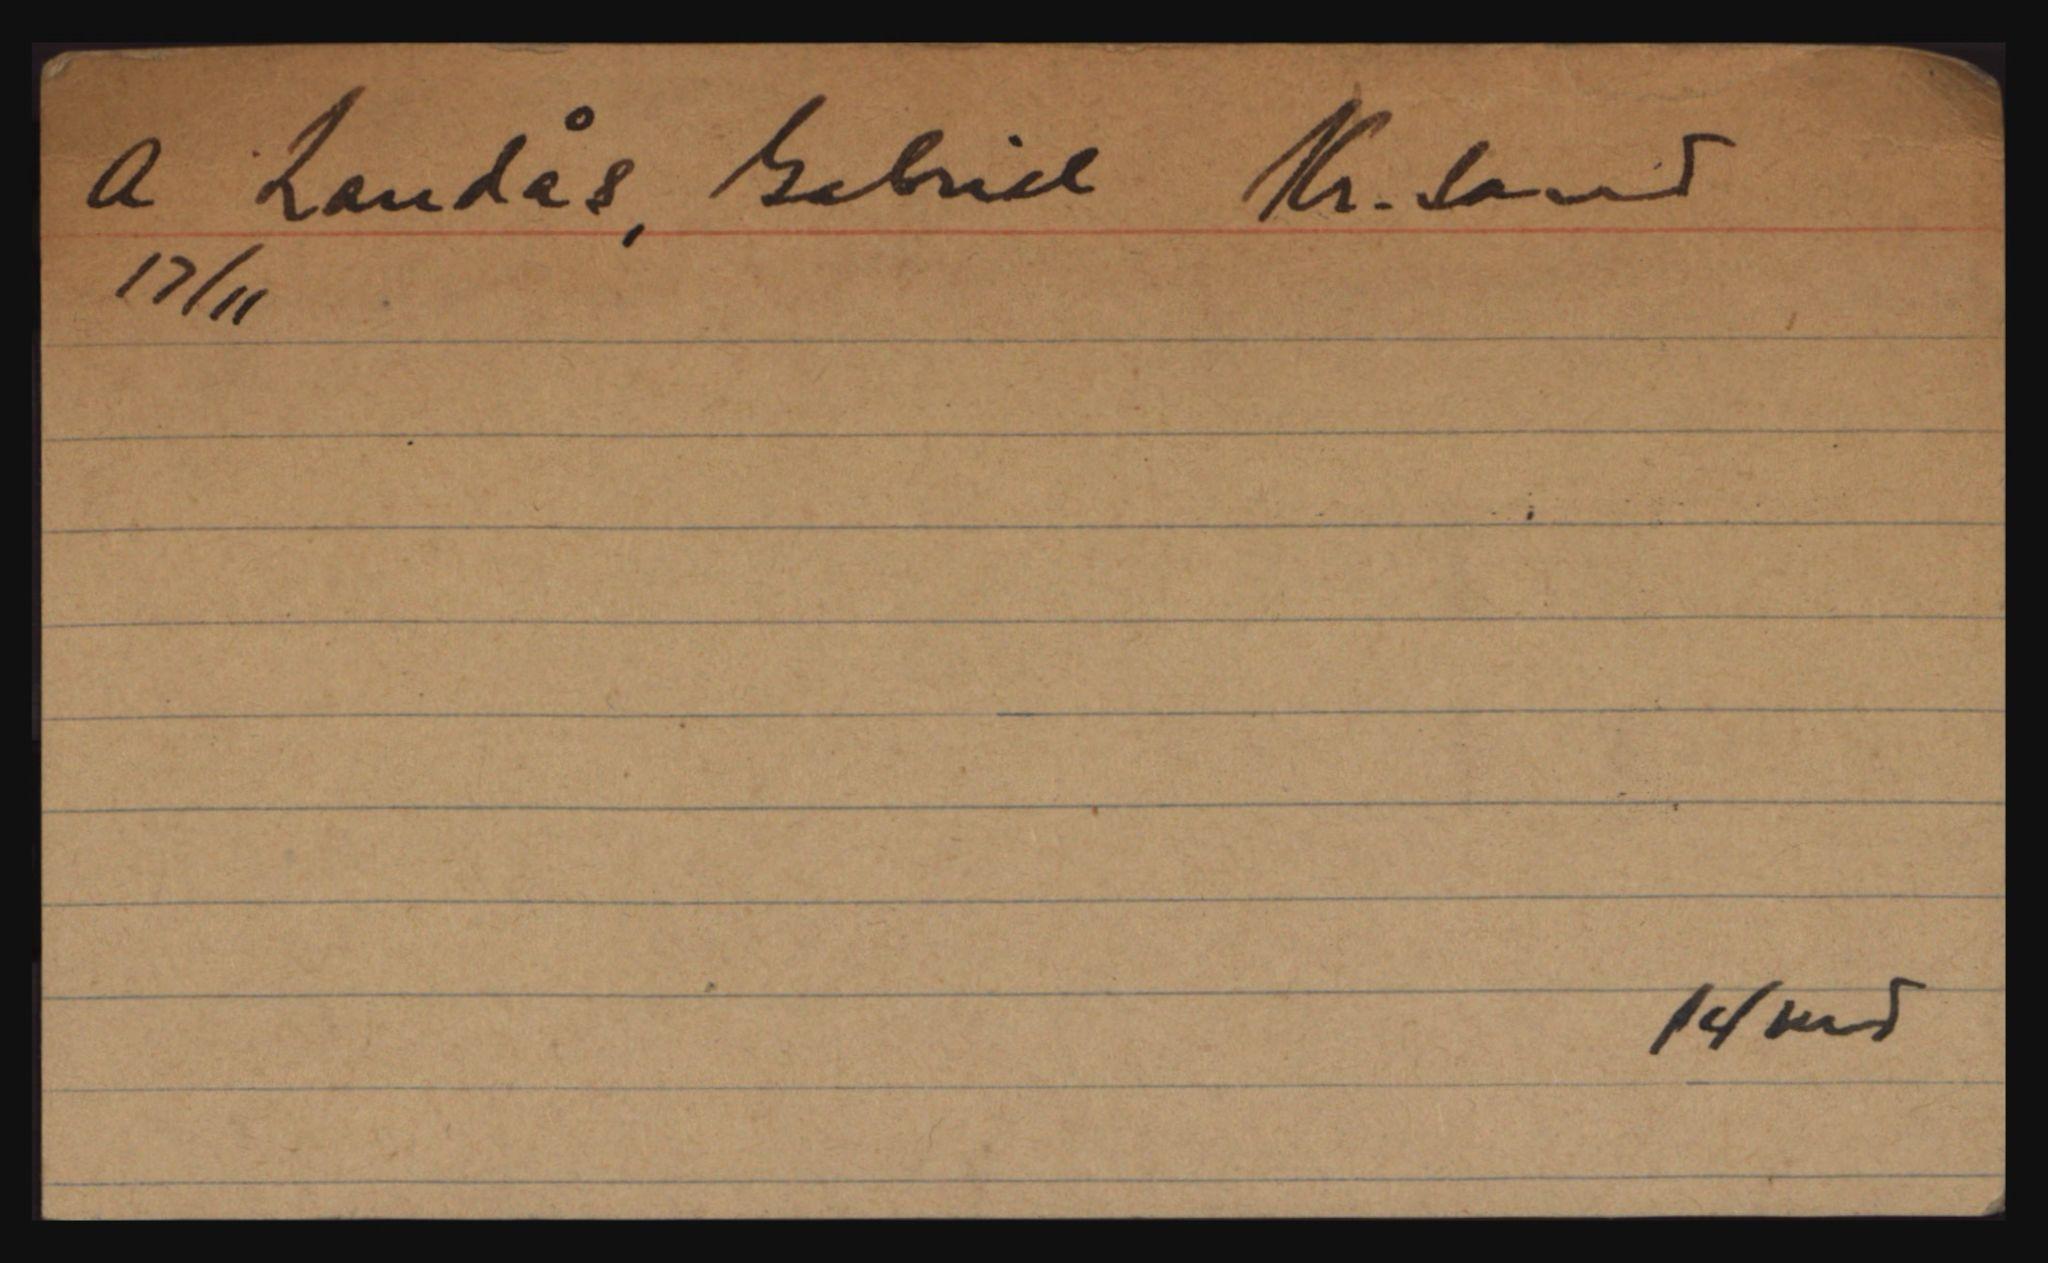 RA, Befehlshaber der Sicherheitspolizei und des SD, E/Eb/L0002: Kartotekkort over fanger i Akershus fengsel: L-Å, 1940-1945